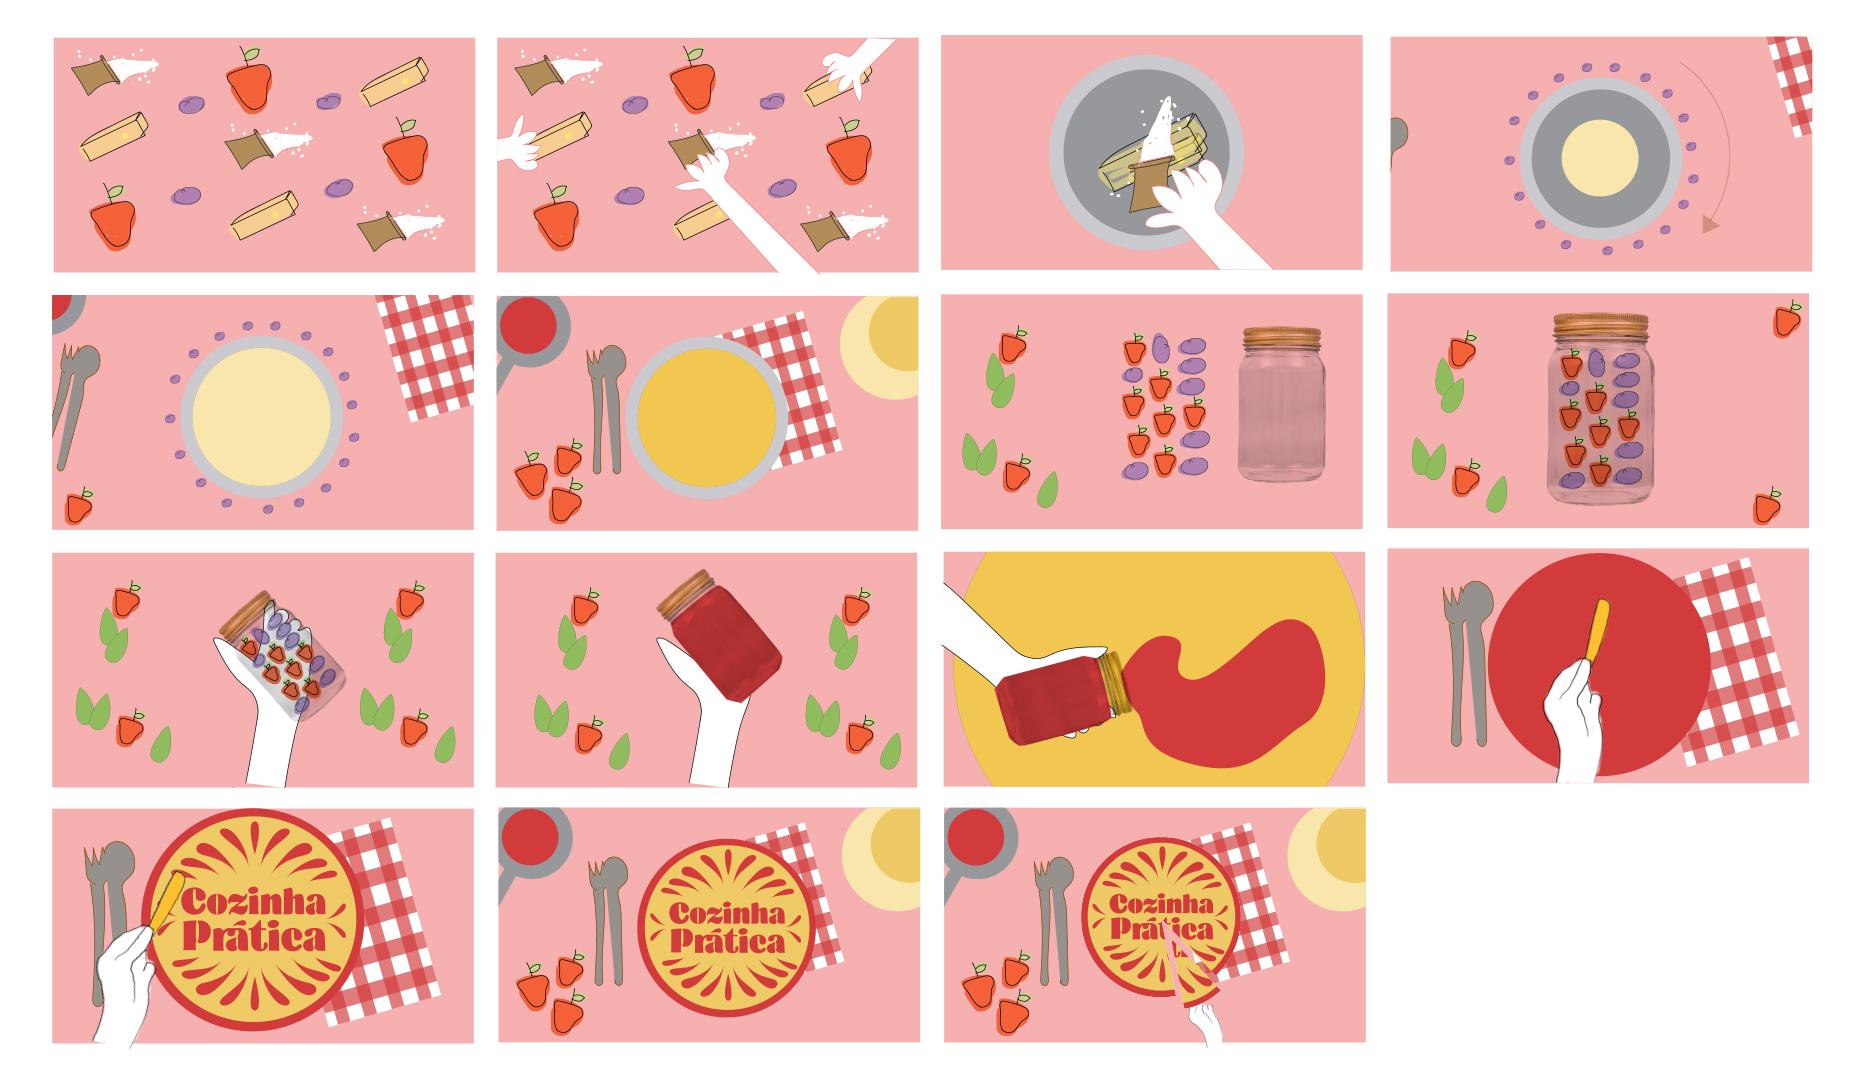 Cheesecake storyboard